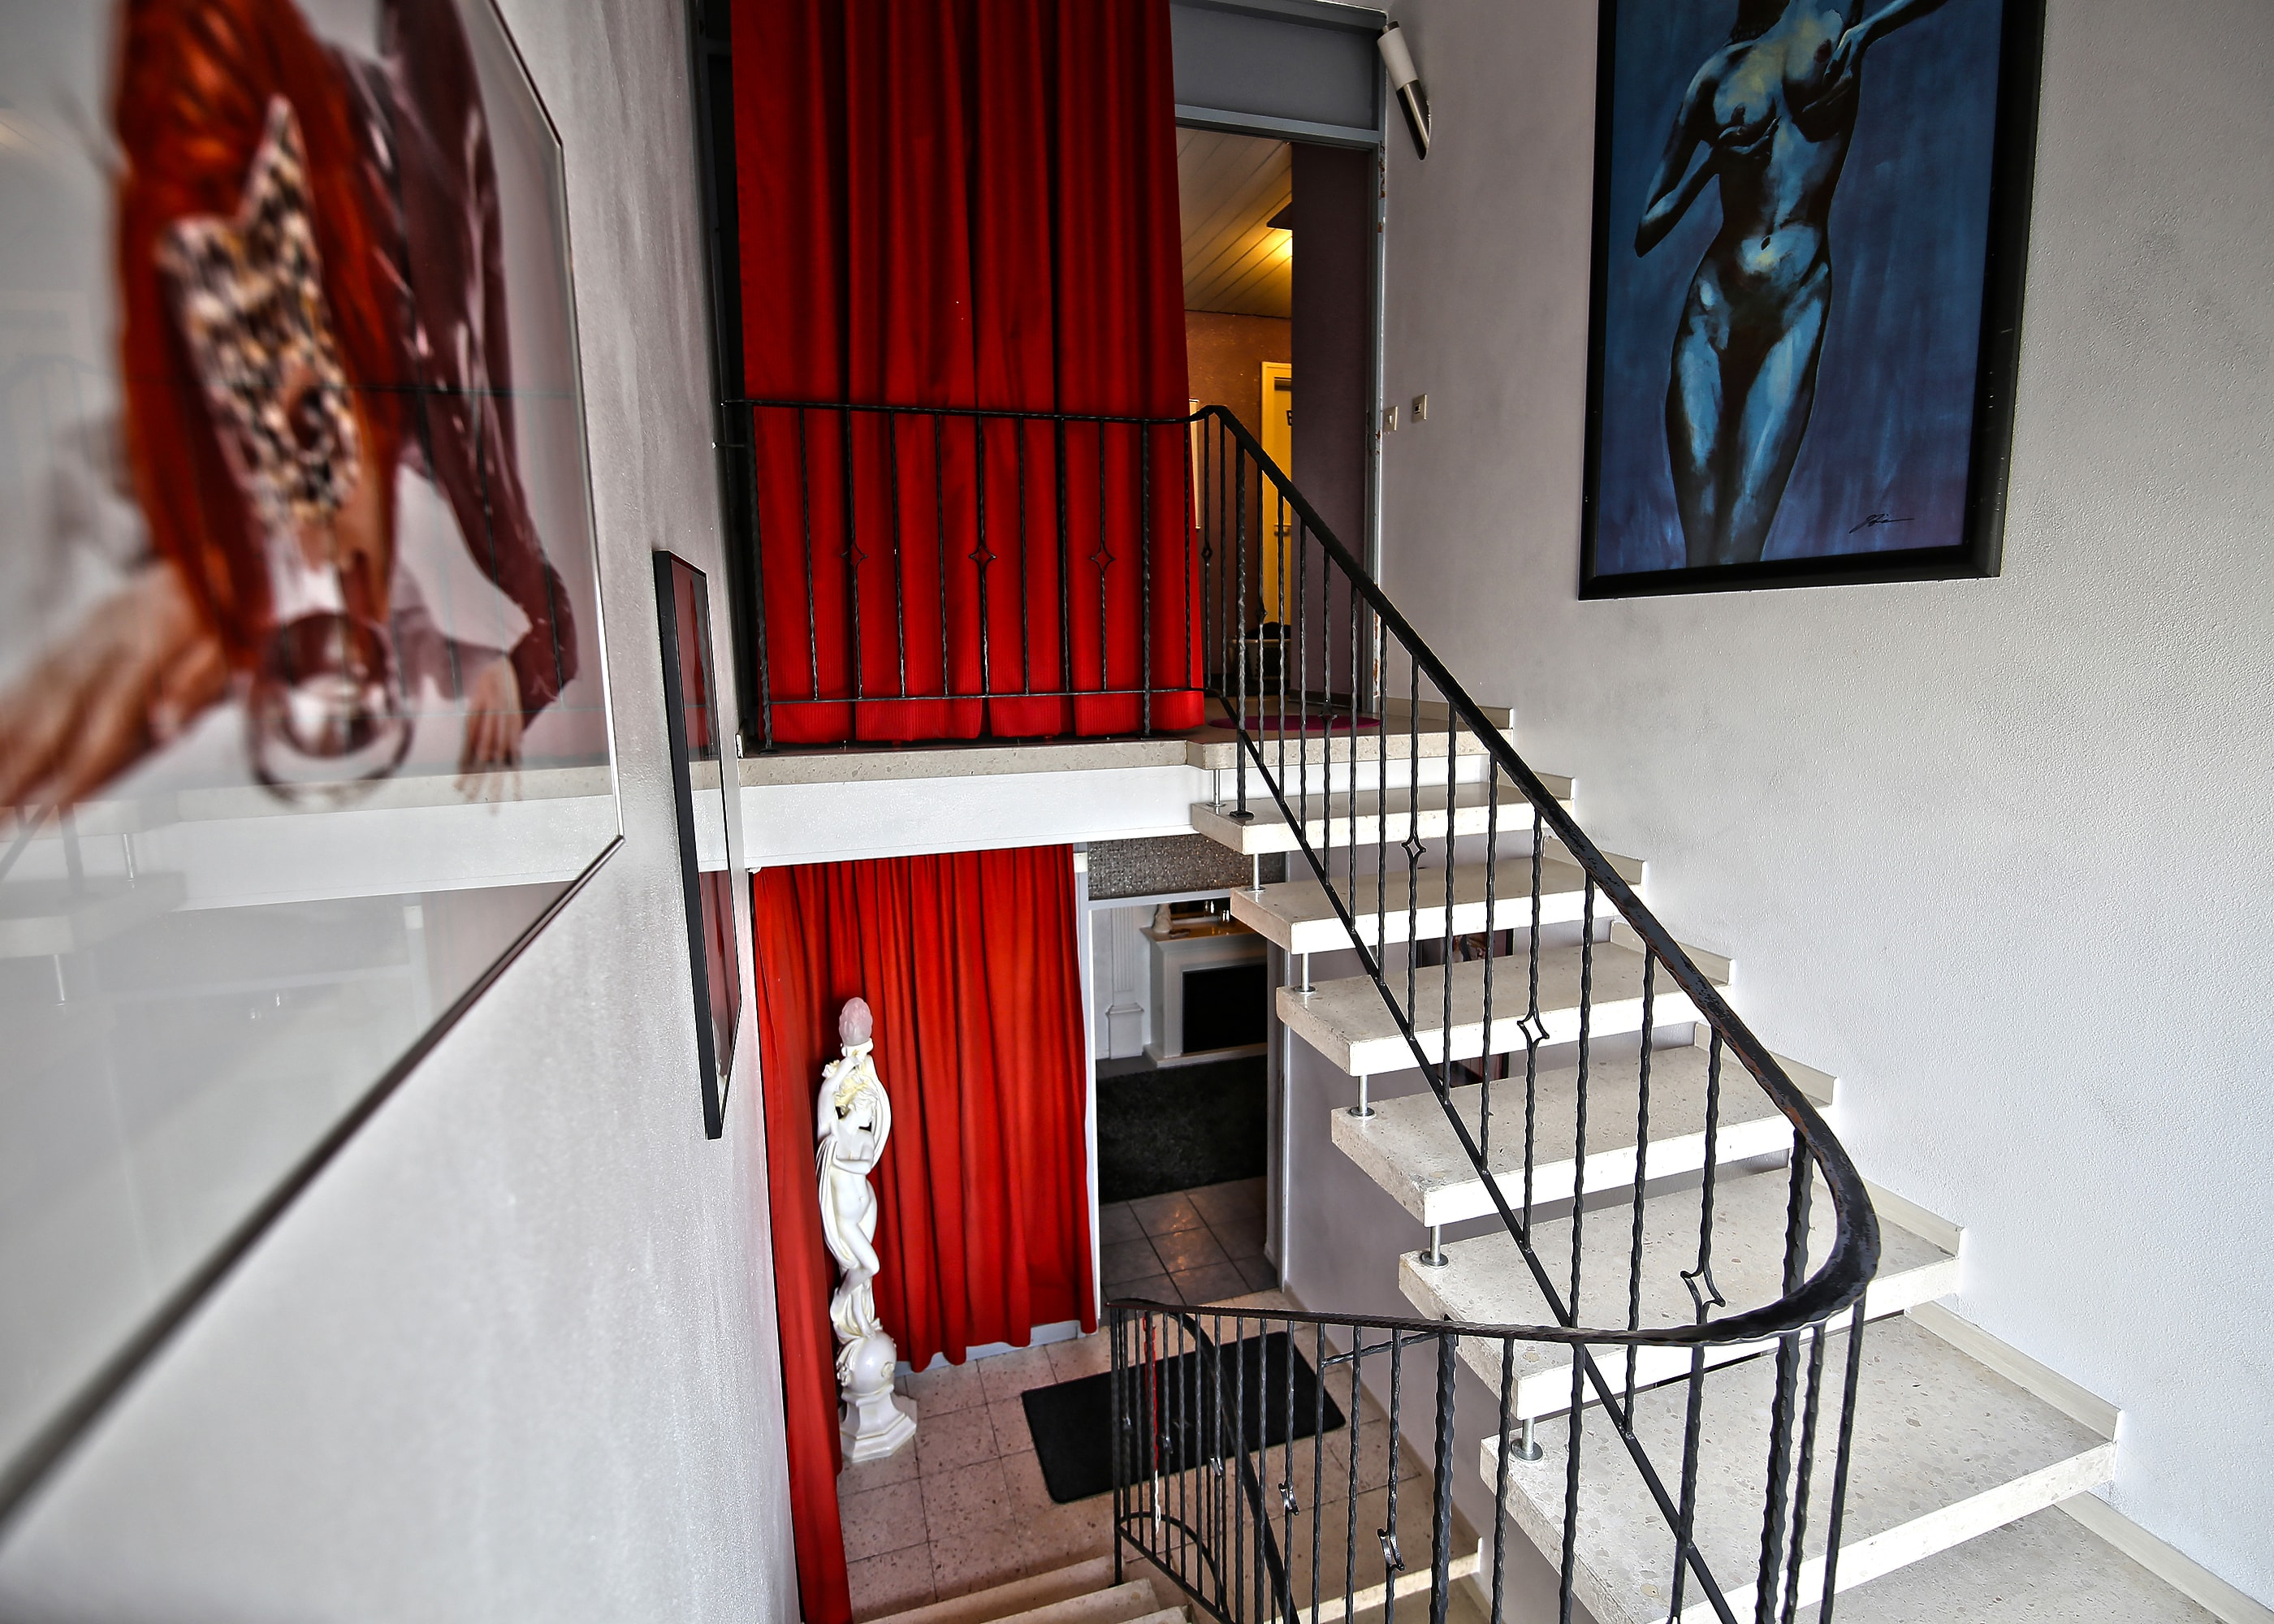 Treppenhaus2-min